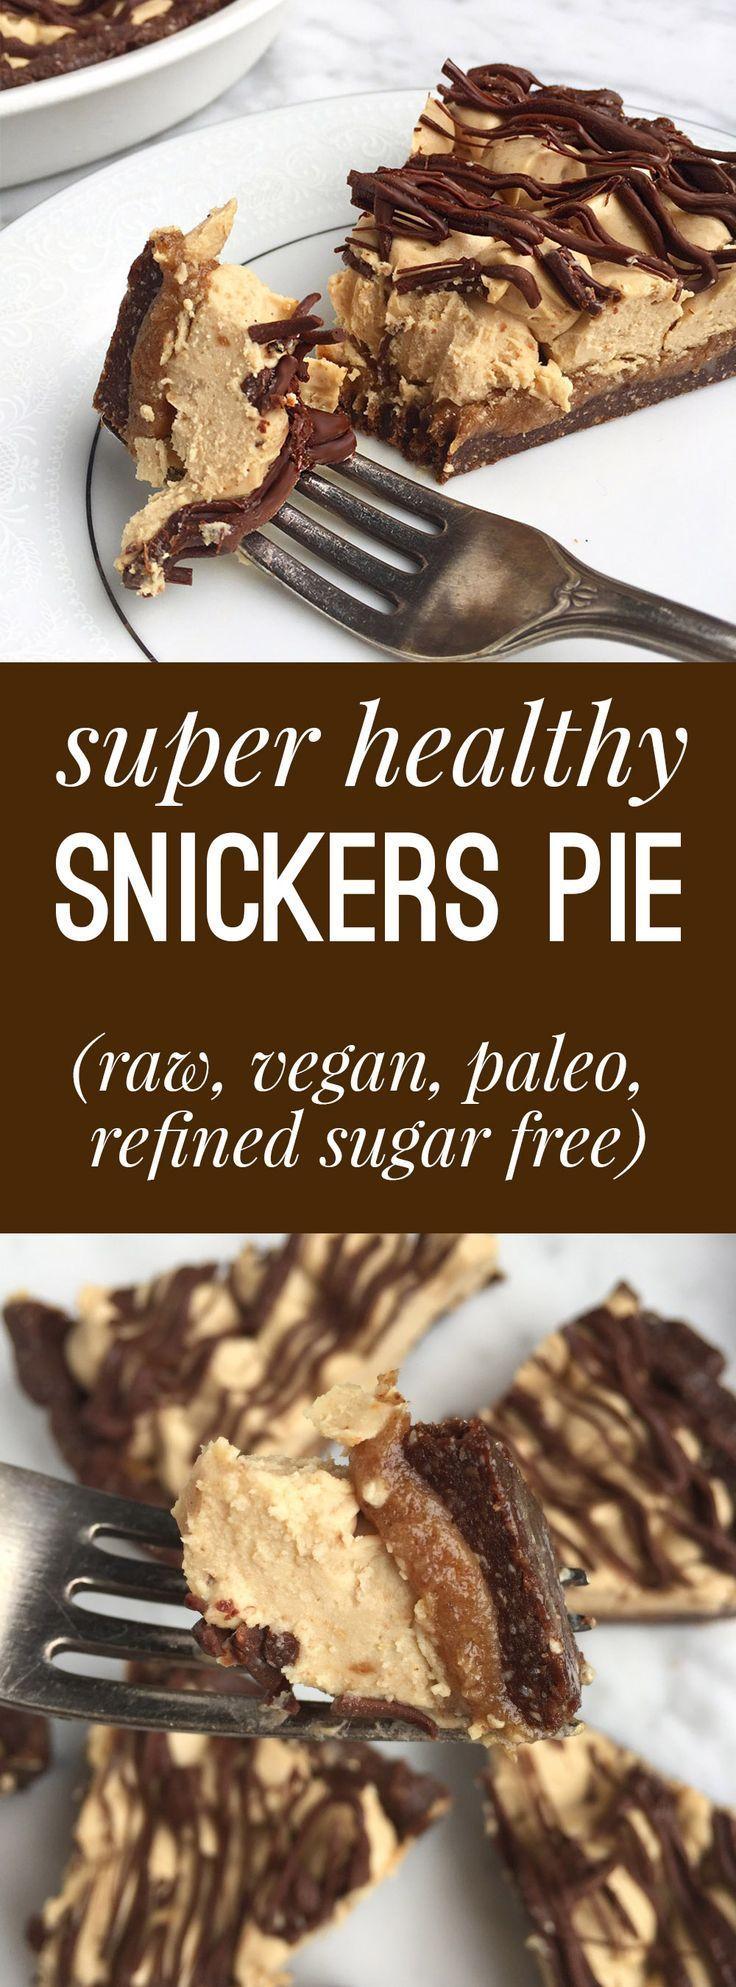 Super Healthy Snickers Pie Gluten Free Paleo Vegan Raw Liz Moody Recipe Raw Desserts Raw Vegan Desserts Healthy Sweets